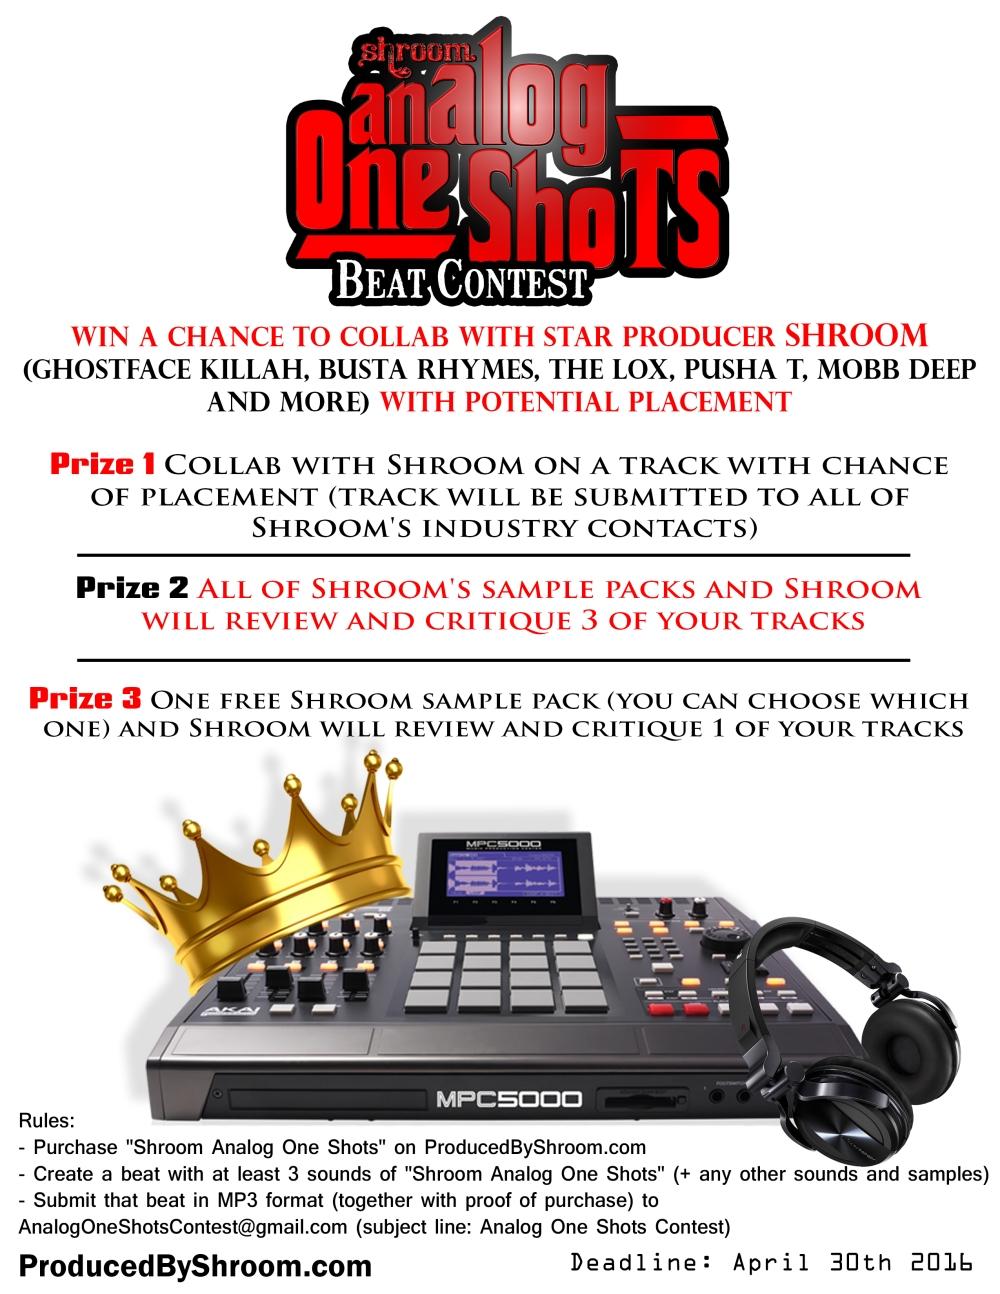 000000 beat contest 3 (1)